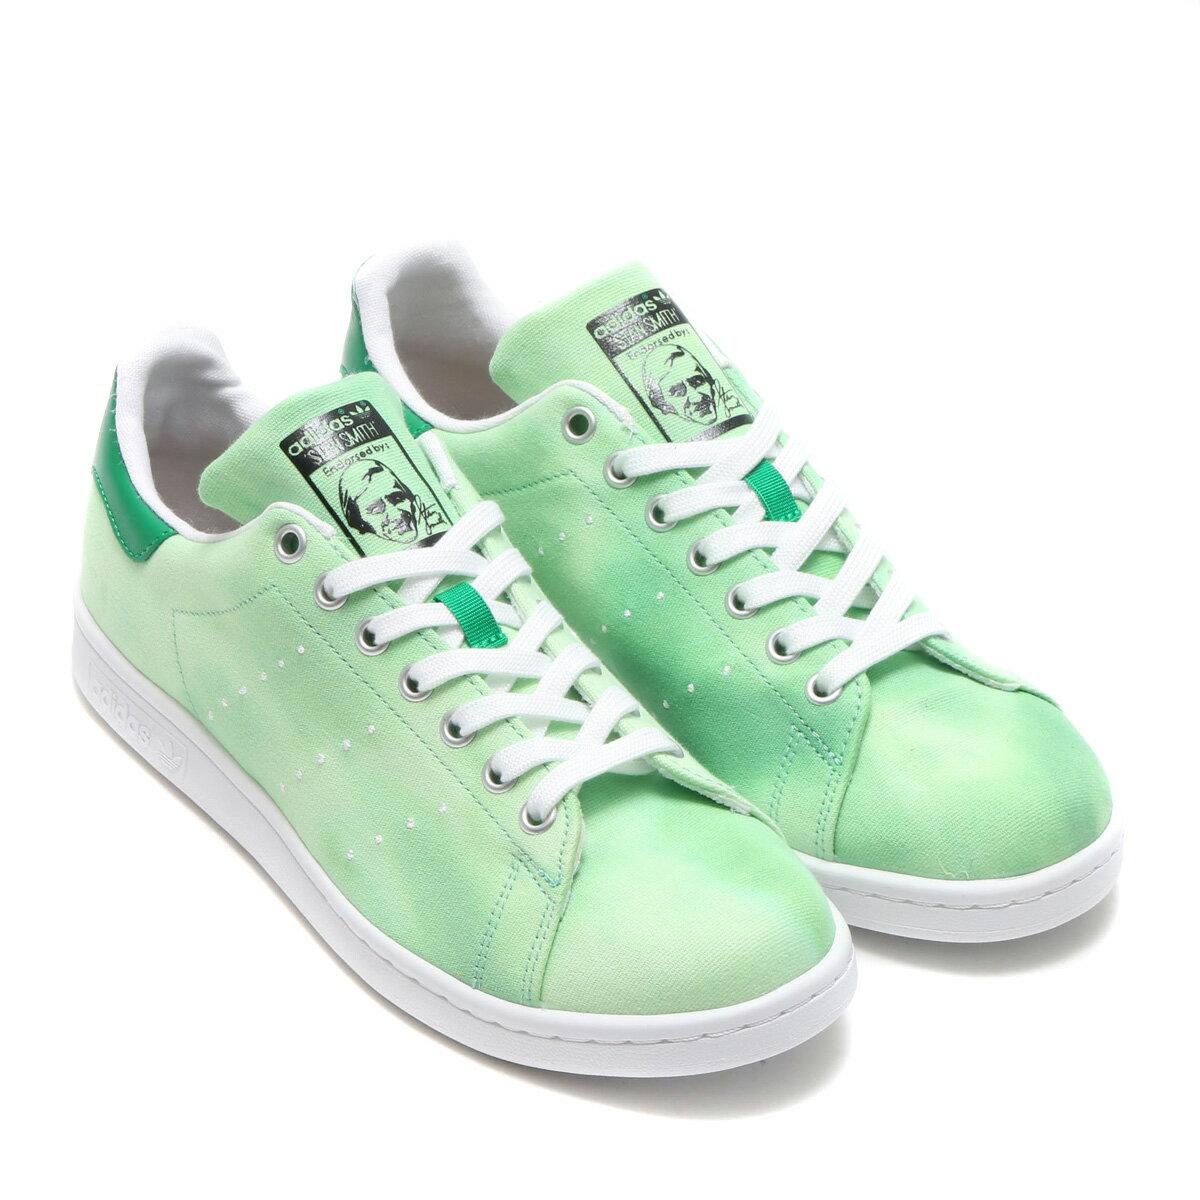 adidas Originals PW HU HOLI STAN SMITH (アディダス オリジナルス ファレル ウィリアムス HU HOLI スタンスミス)Green / Running White / Running White【メンズ スニーカー】18SS-S